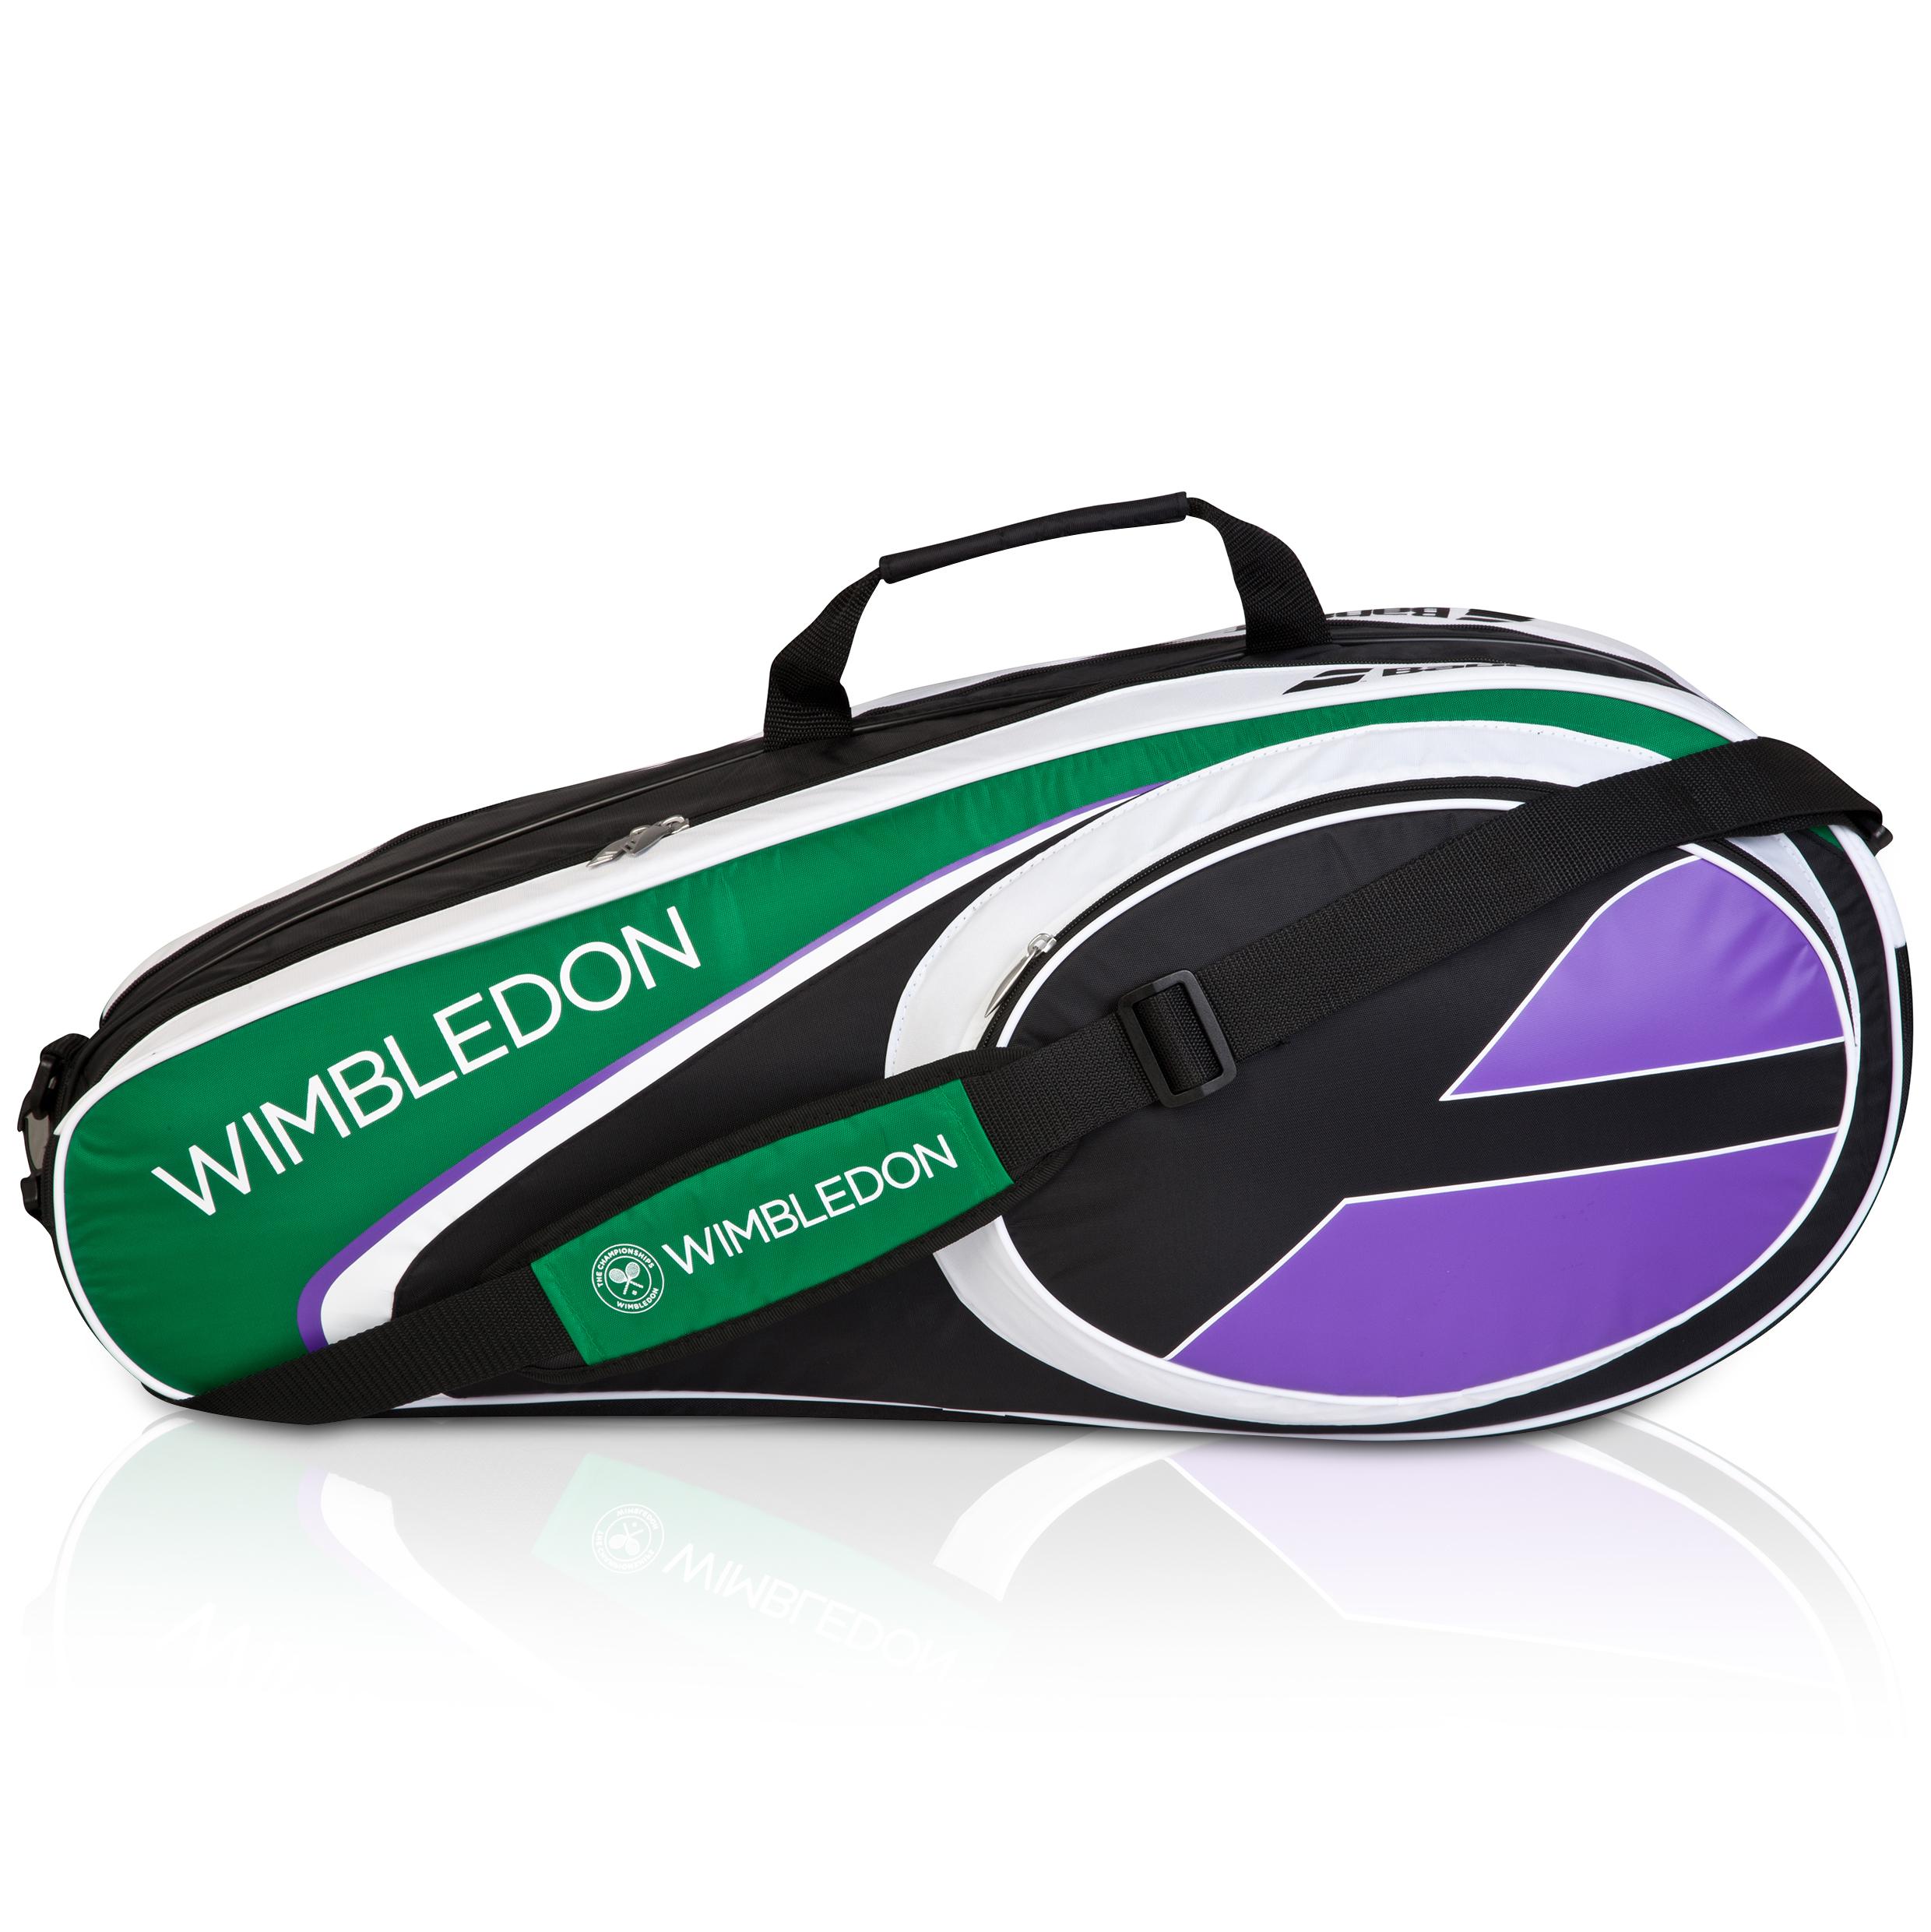 Wimbledon Club x 6 Racket Holder - White/Green White